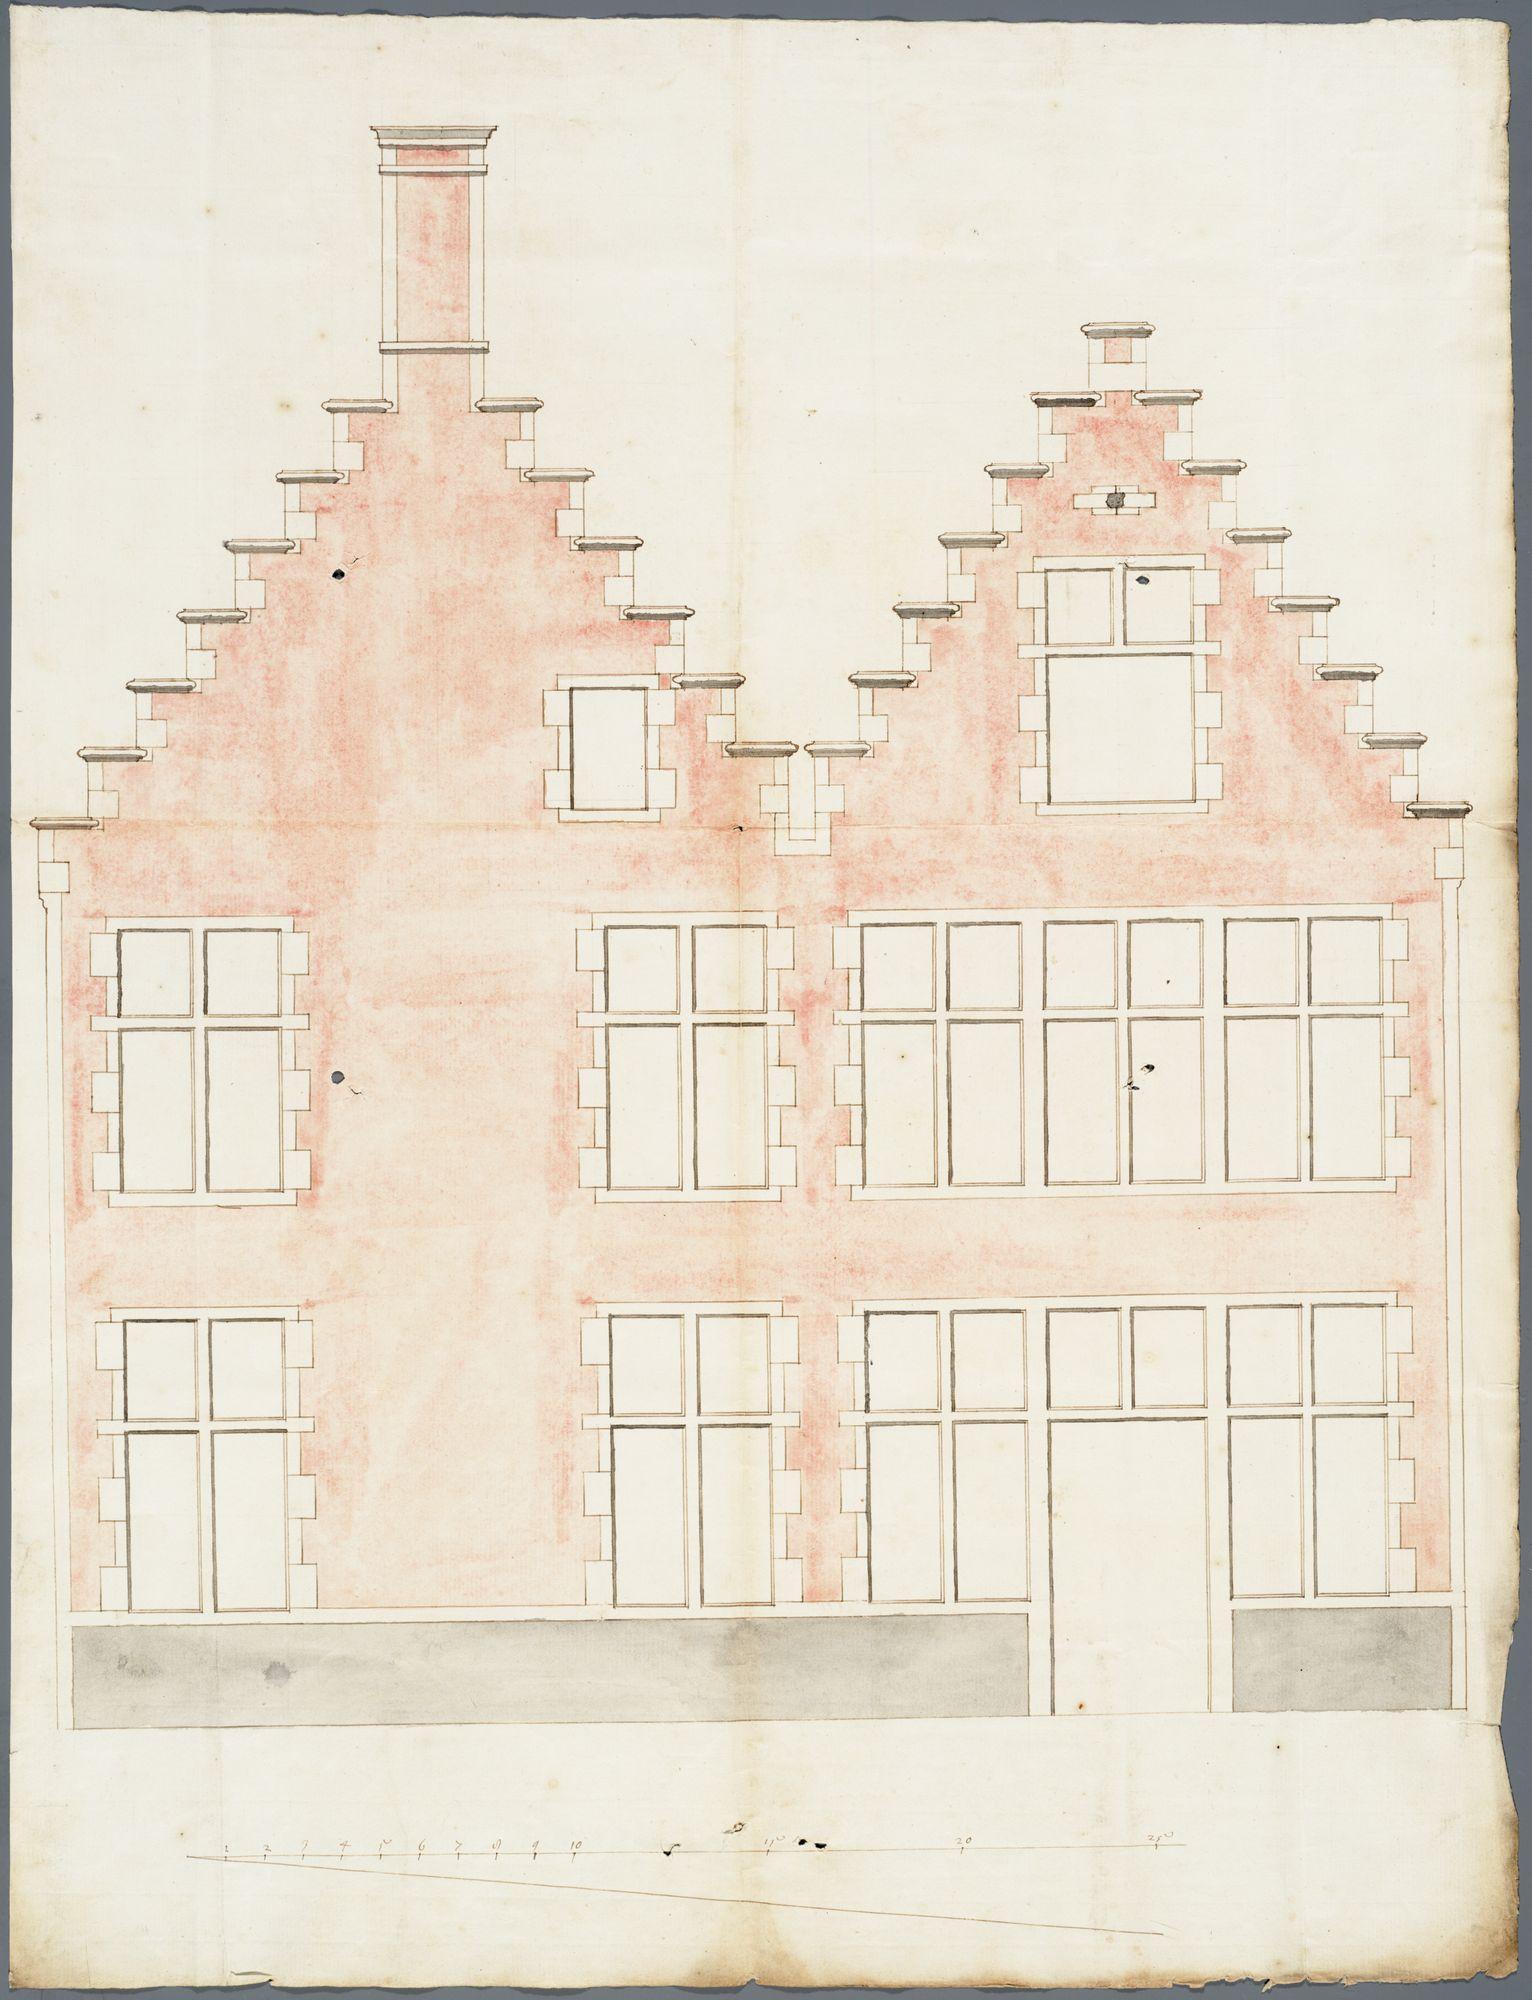 Gent: Ajuinlei, 1724: opstand voorgevel